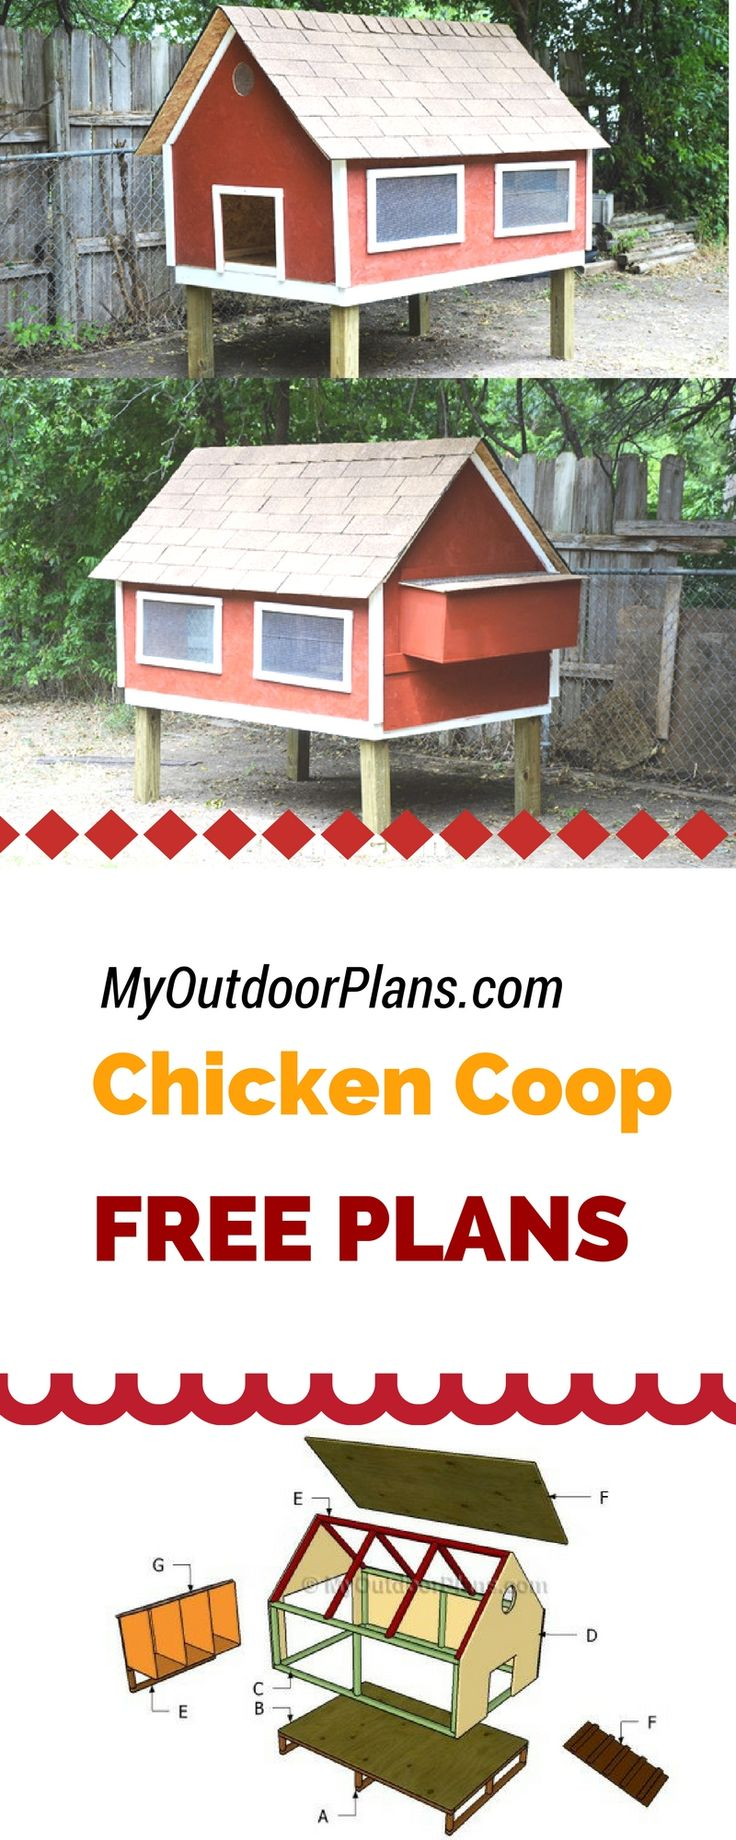 Best 25 easy chicken coop ideas on pinterest chicken for Small backyard chicken coop plans free